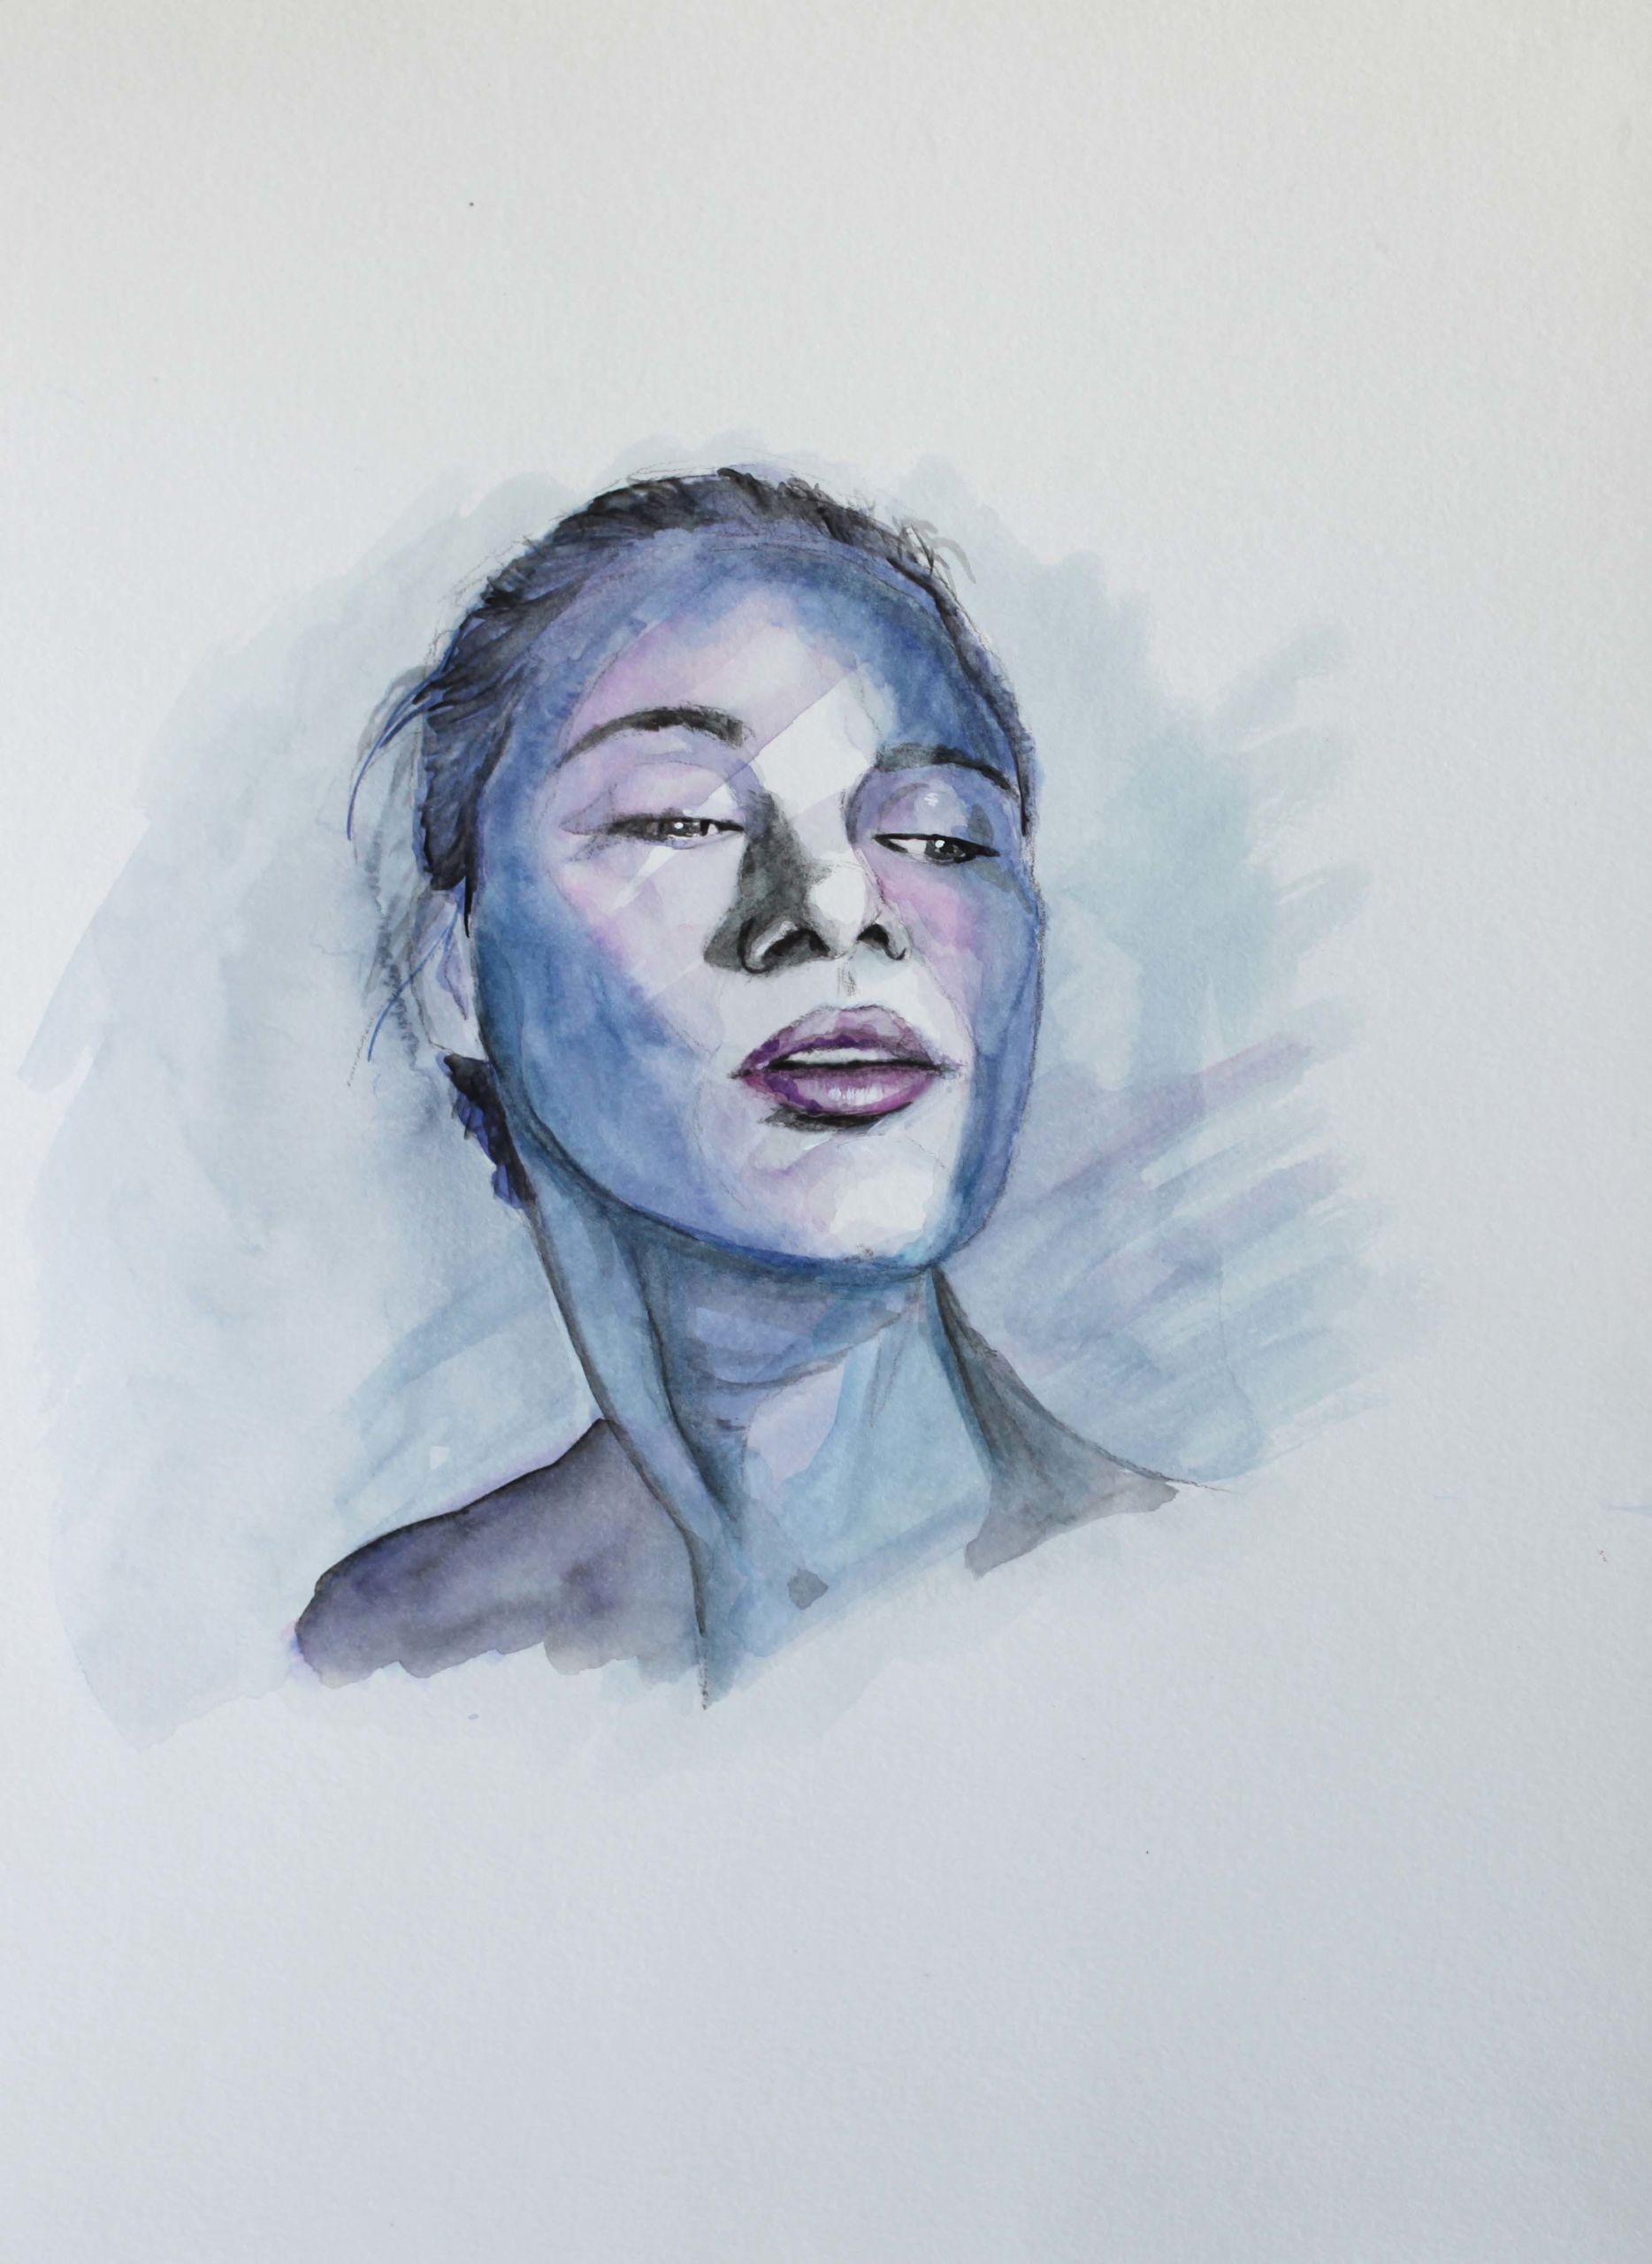 Aquarelle par Priscilla Seiller, artiste peintre